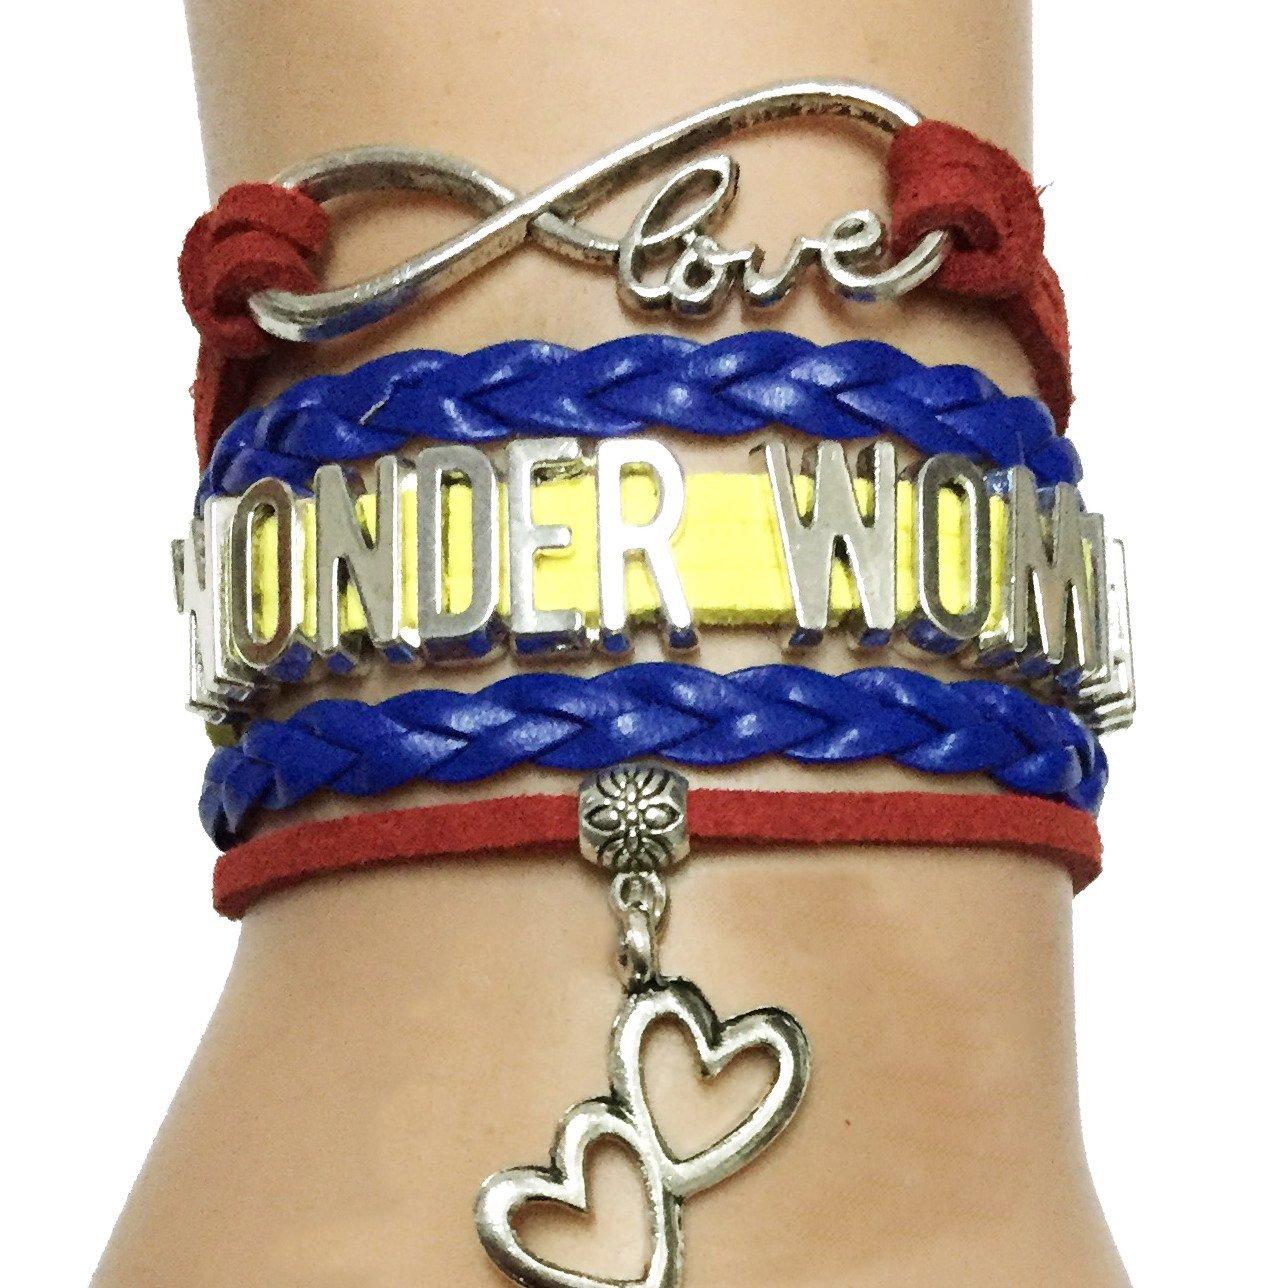 DOLON Brand Wonder Woman Bracelet - Comic-Con -Infinity Jewelry - Cosplay - Perfect Gift idea